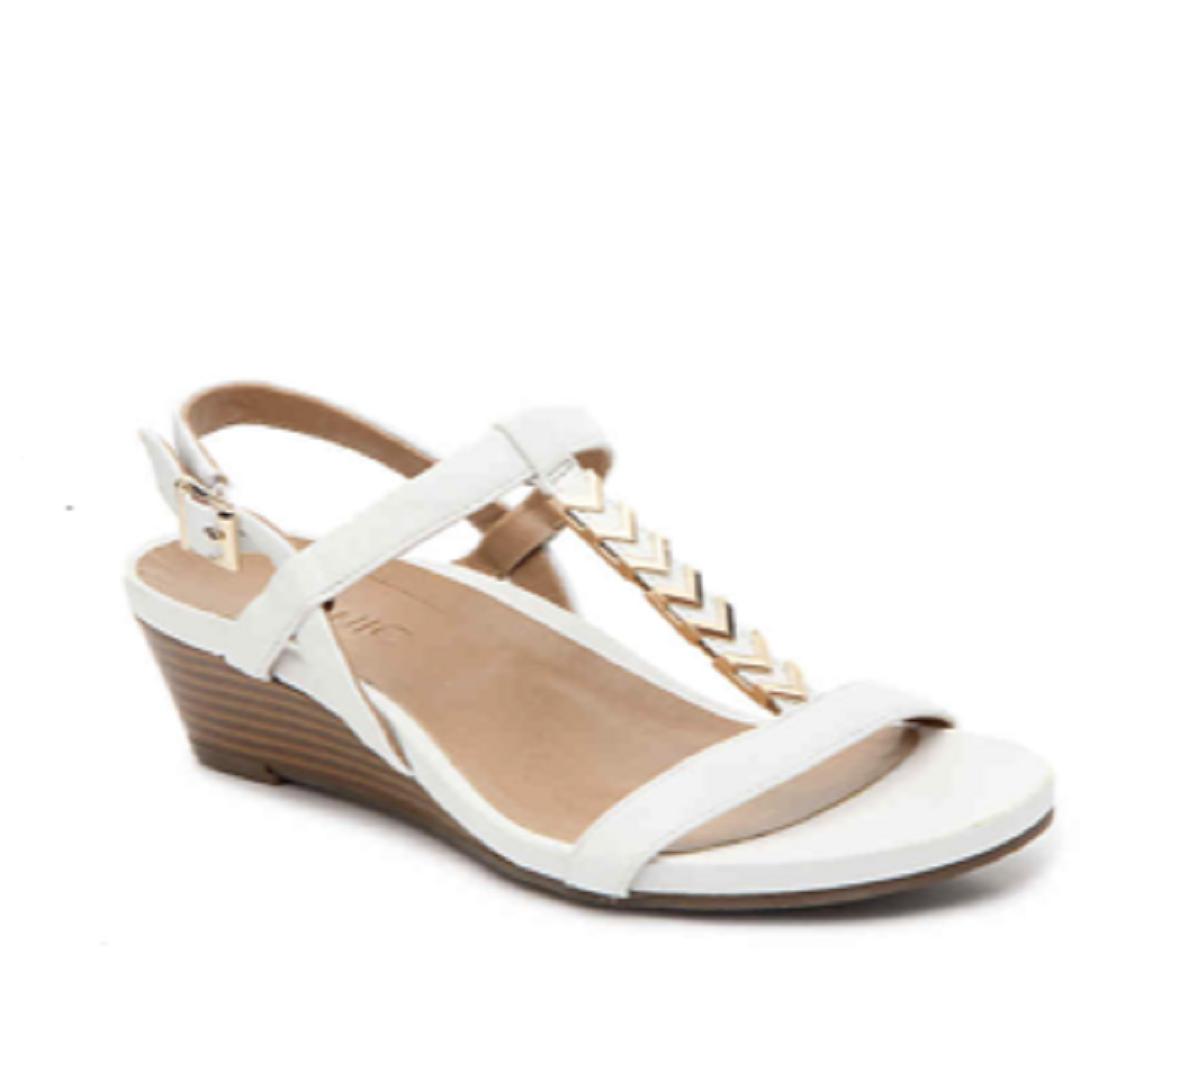 Vionic Women Cali T Strap Leather gold gold gold Hardware Wedge Sandals WHITE Sz 9M NIB a9da5a